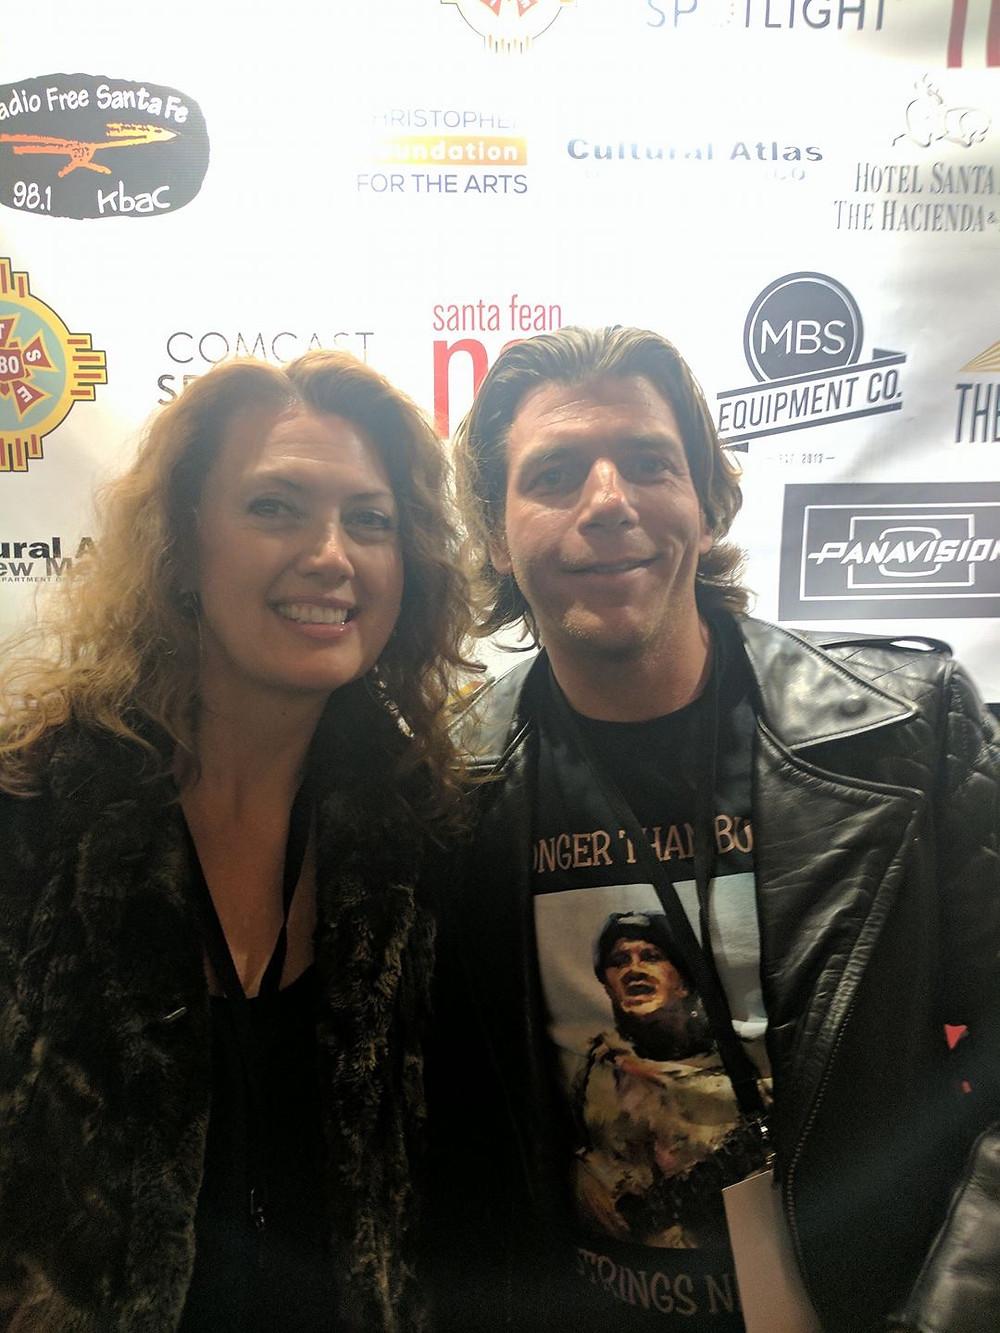 Laura Lockwood (Heavy Feathers) and Matthew Millan (Stronger than Bullets) at Santa Fe Film Festival 2016